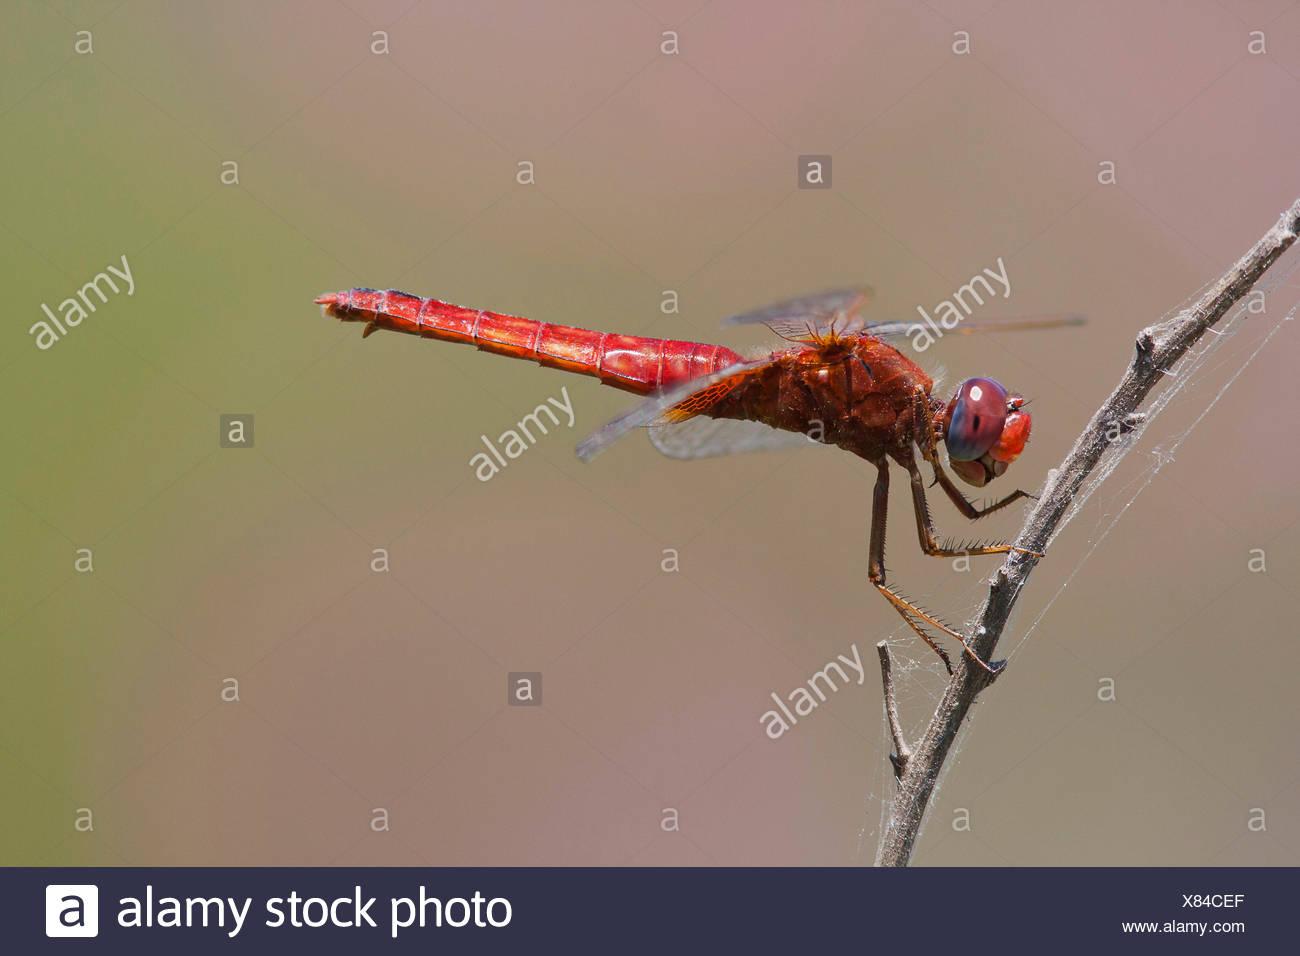 Broad Scarlet, Common Scarlet-darter, Scarlet Darter, Scarlet Dragonfly (Crocothemis erythraea, Croccothemis erythraea), at a stem, Turkey, Anatolia, Lycia Stock Photo